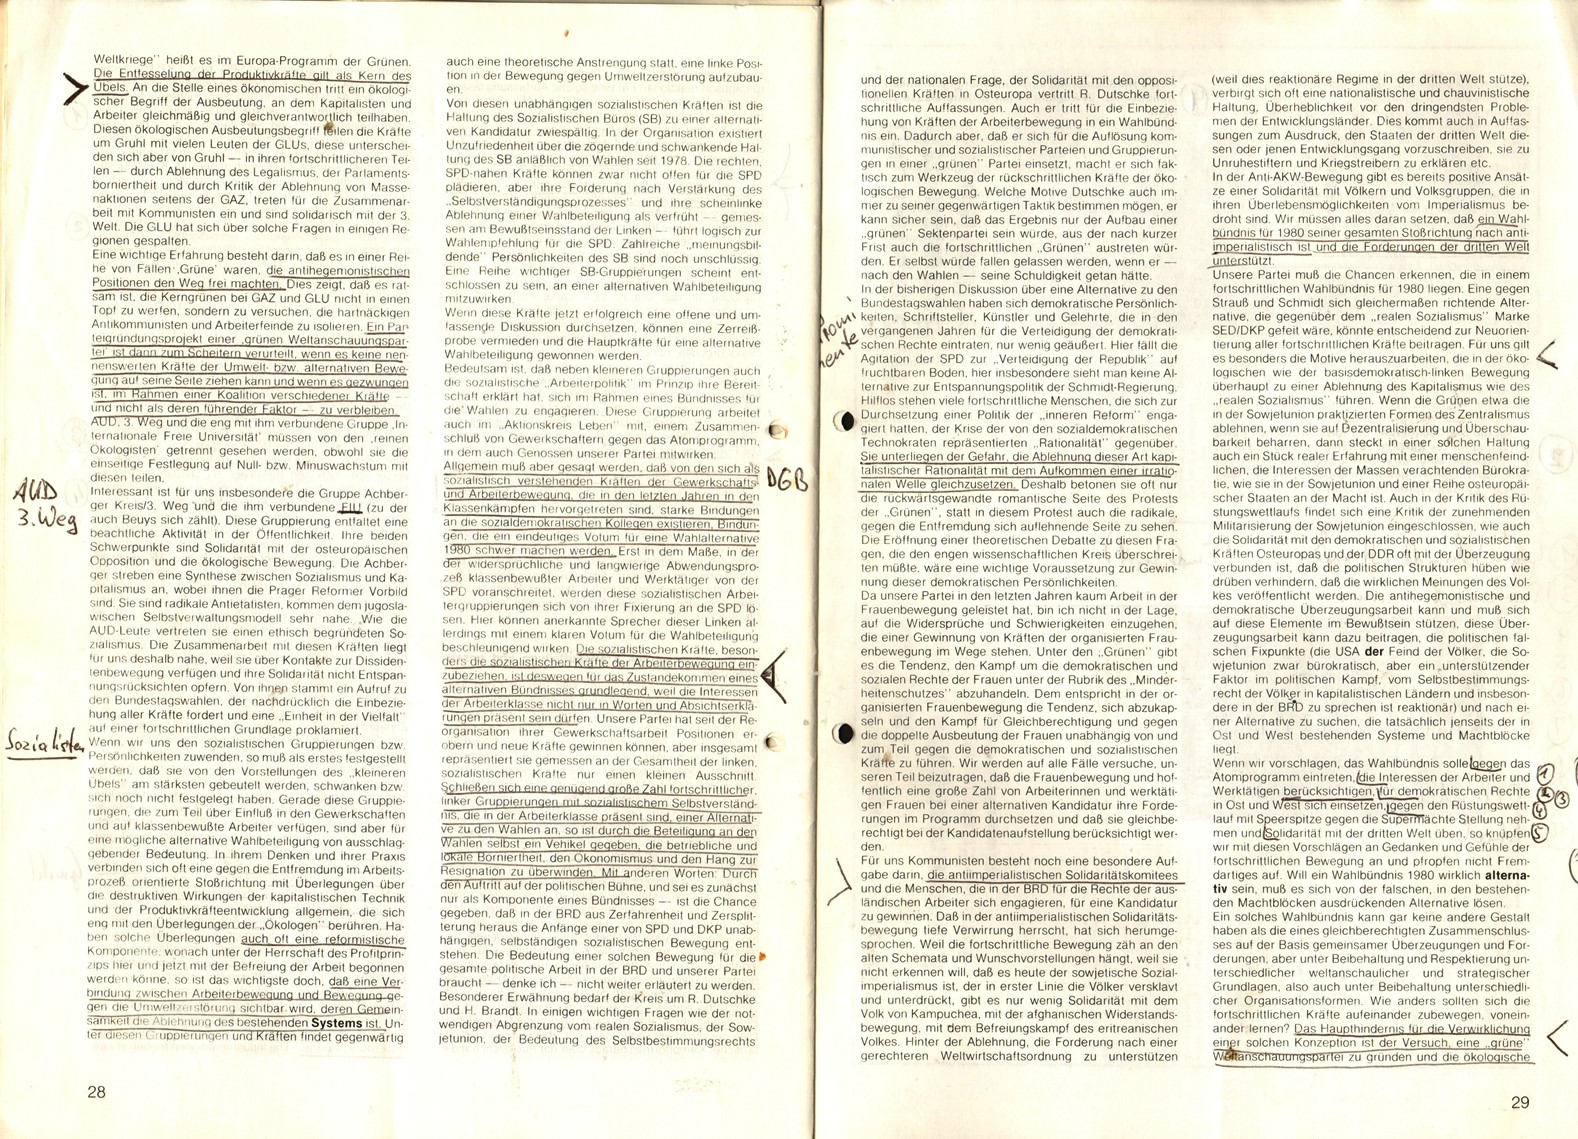 KPDAO_1979_Diskussion_Bundestagswahlen_1980_15